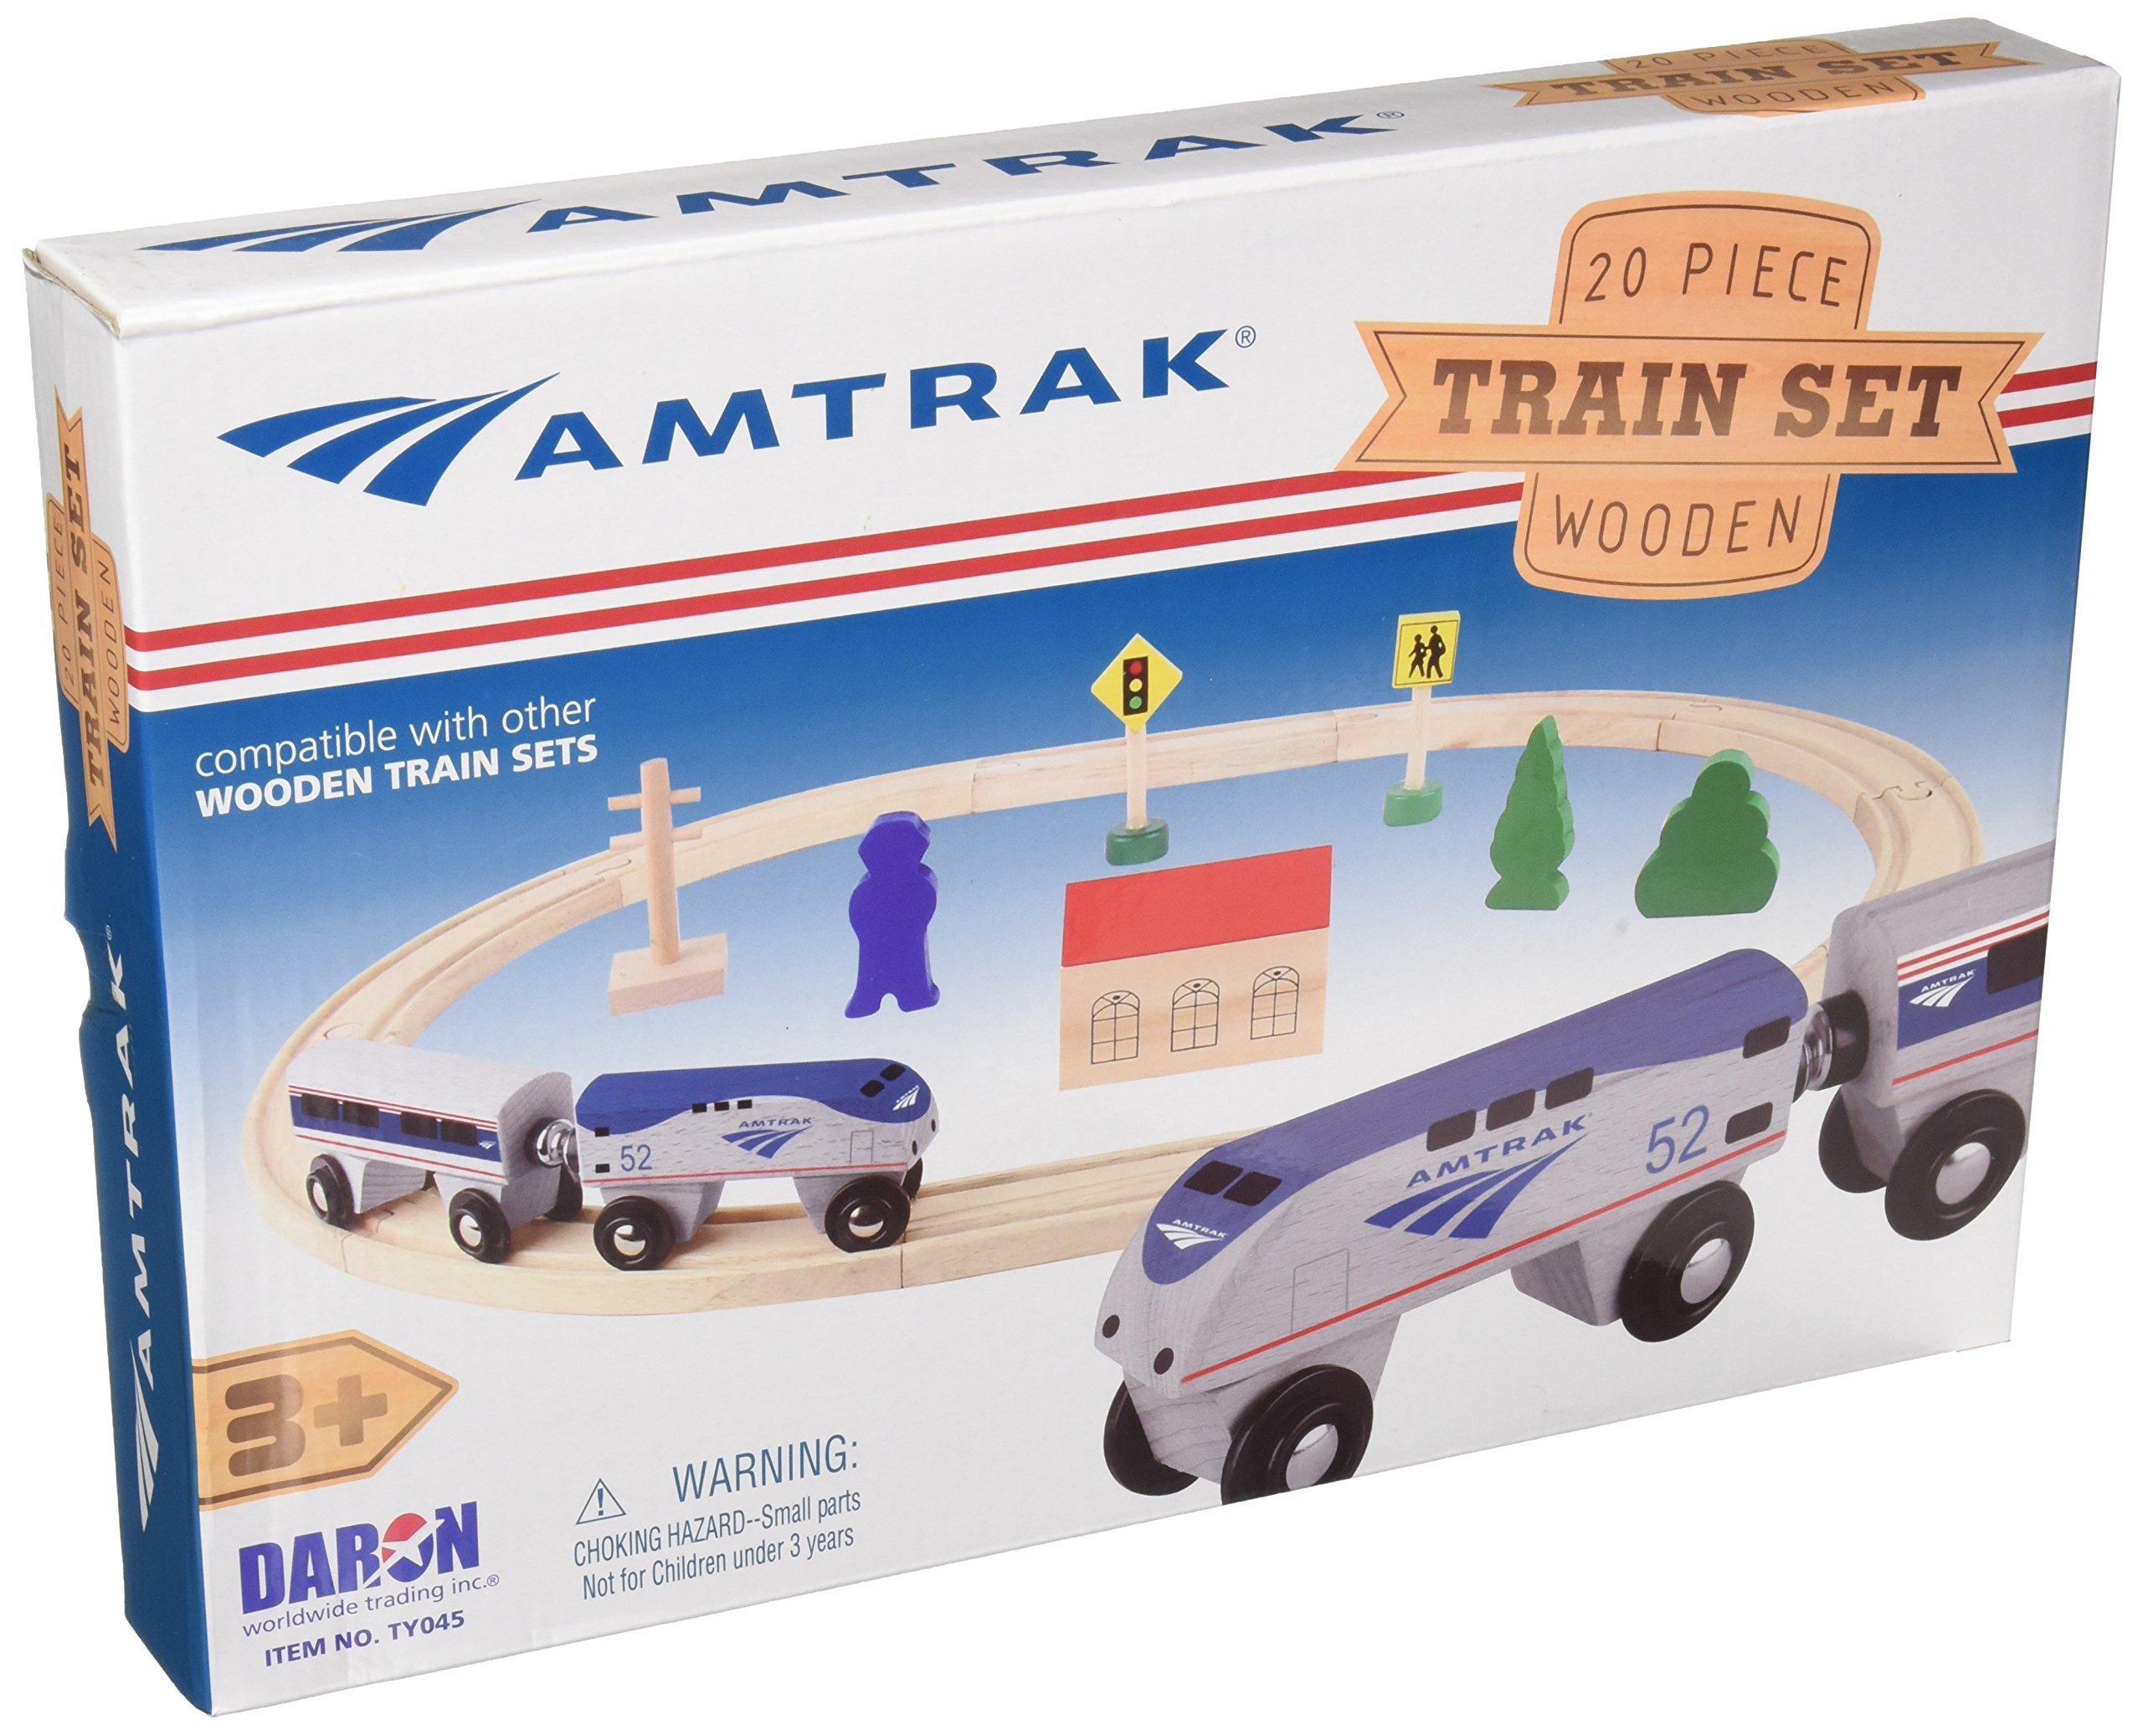 Daron Worldwide Trading Daron Amtrak Wooden Train Set (20 Piece)